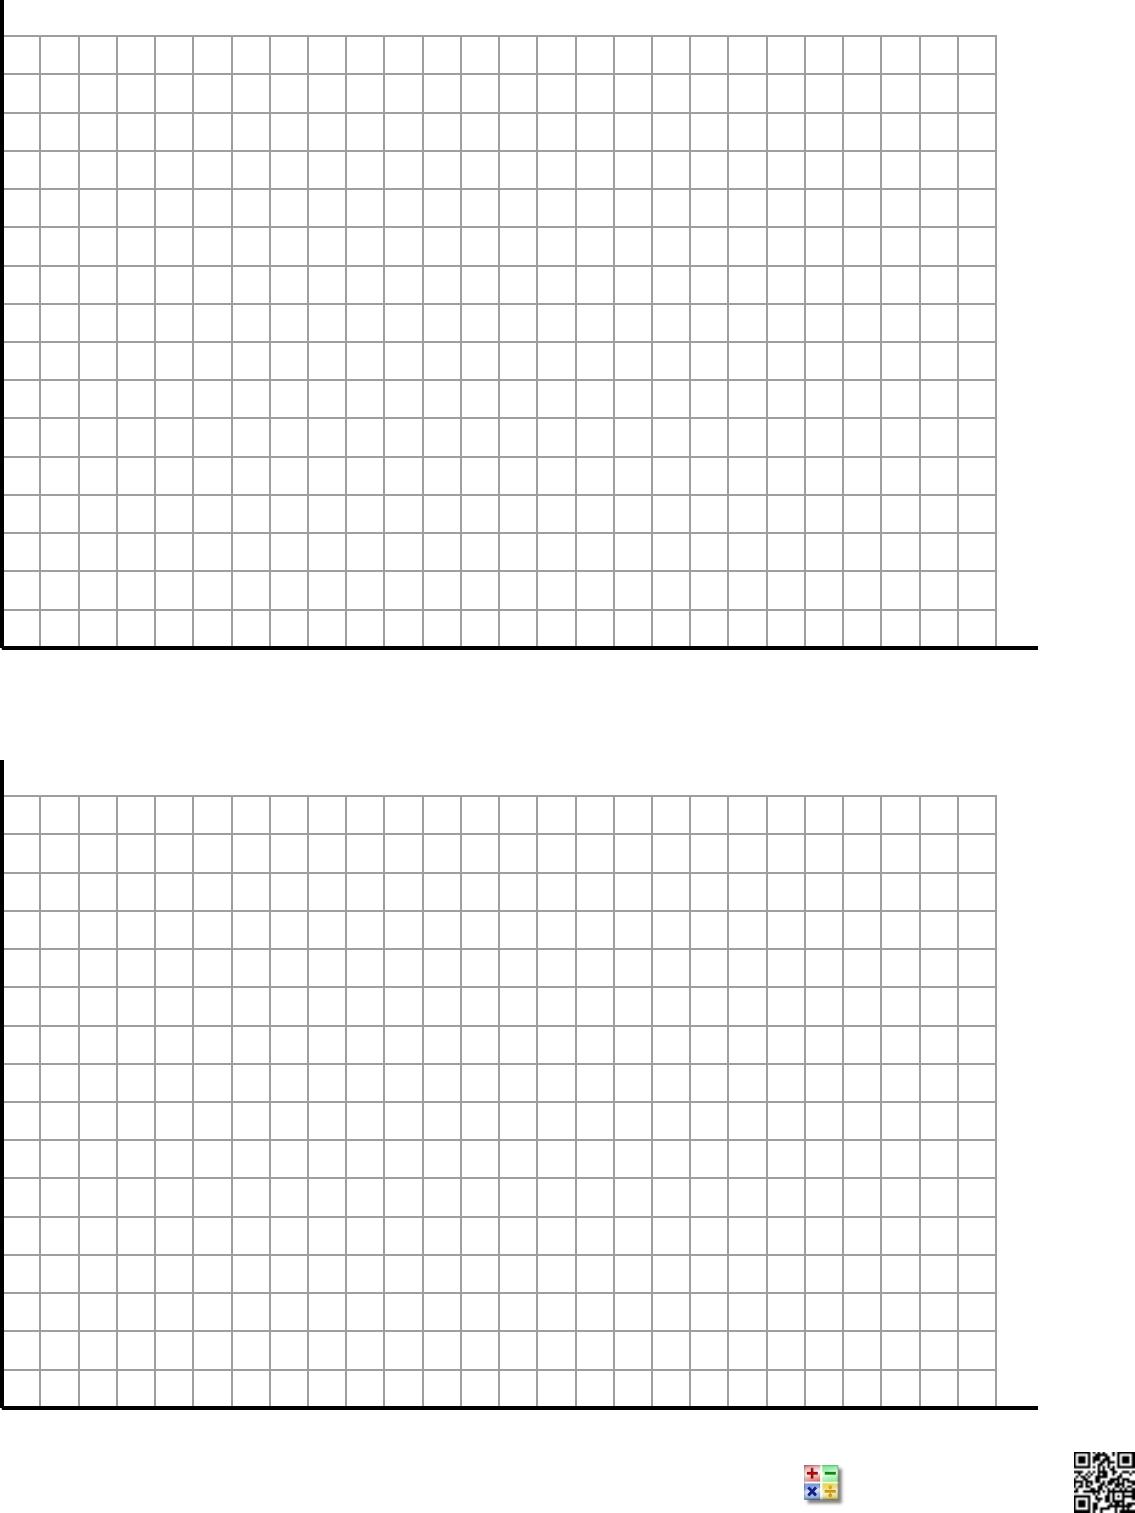 Blank Quadrant 1 Calendar June